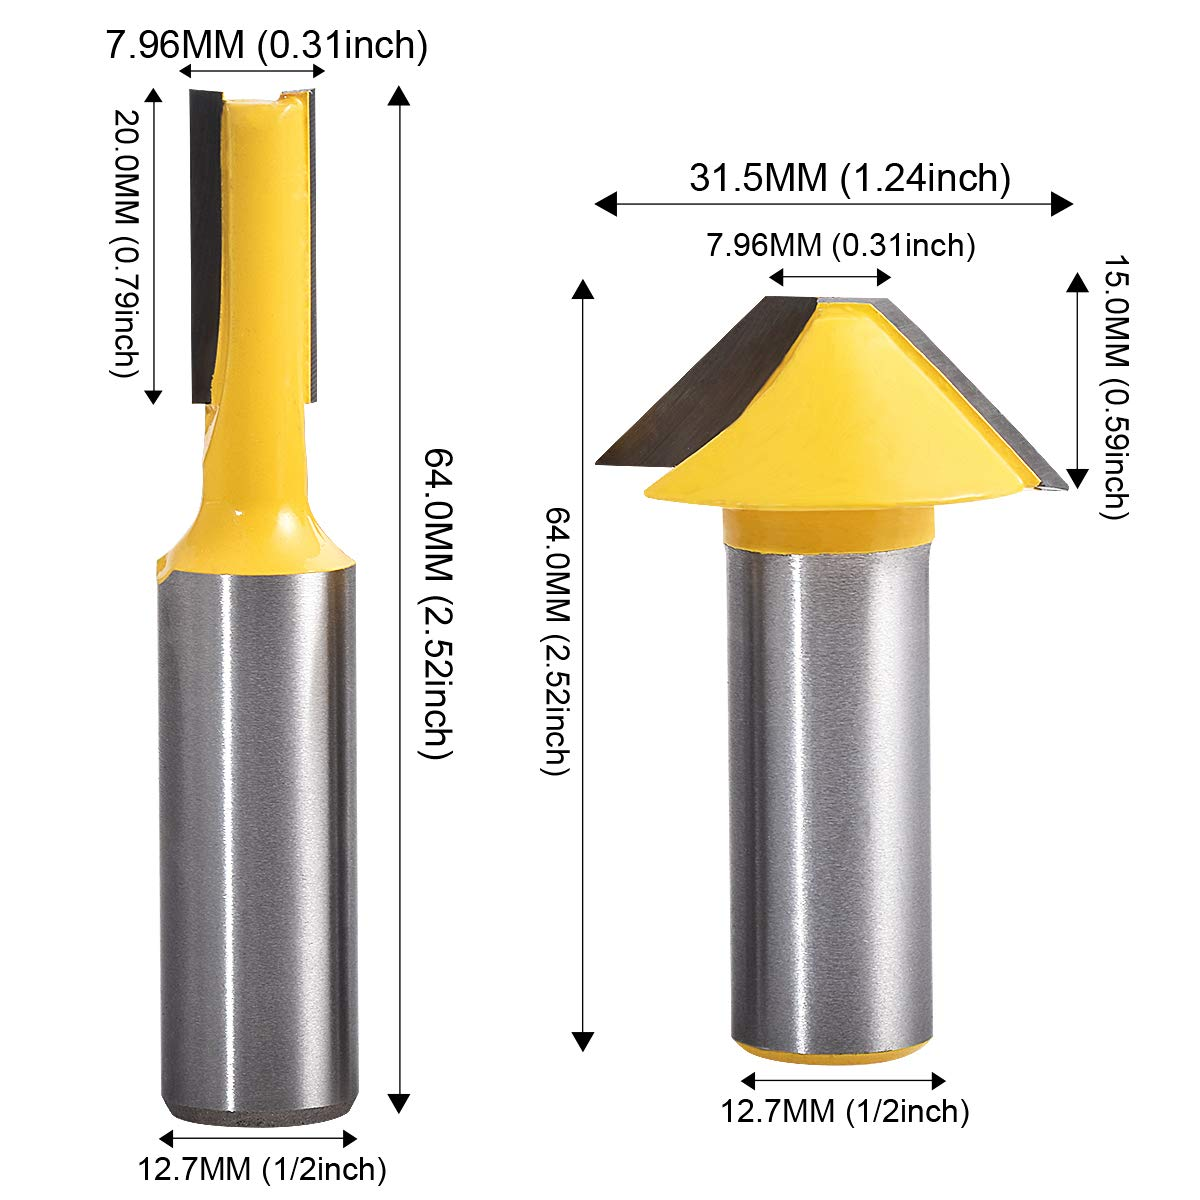 HOHXEN High Carbon Steel Cord Drill Bits Set Wood Working Plug Cutters Set 5//8,1//2,3//8,1//4 4 Pcs//Set